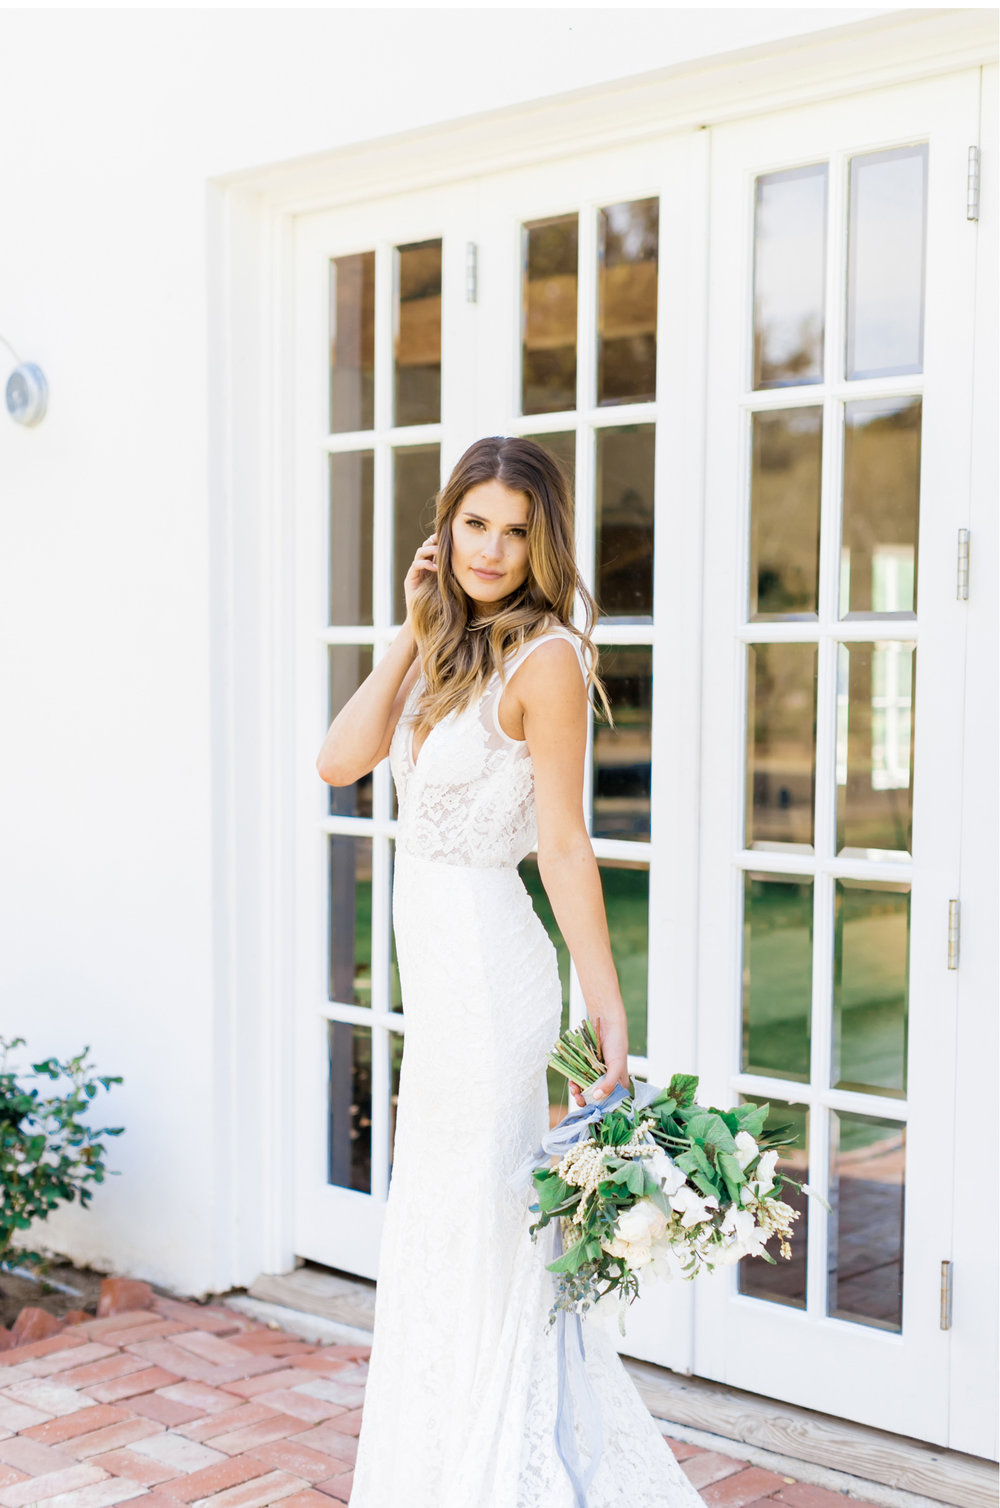 Malibu-Wedding-Photographer-Dani-Piercy-Inspired-by-This-Triunfo-Creek-Wedding-Natalie-Schutt-Photography_12.jpg